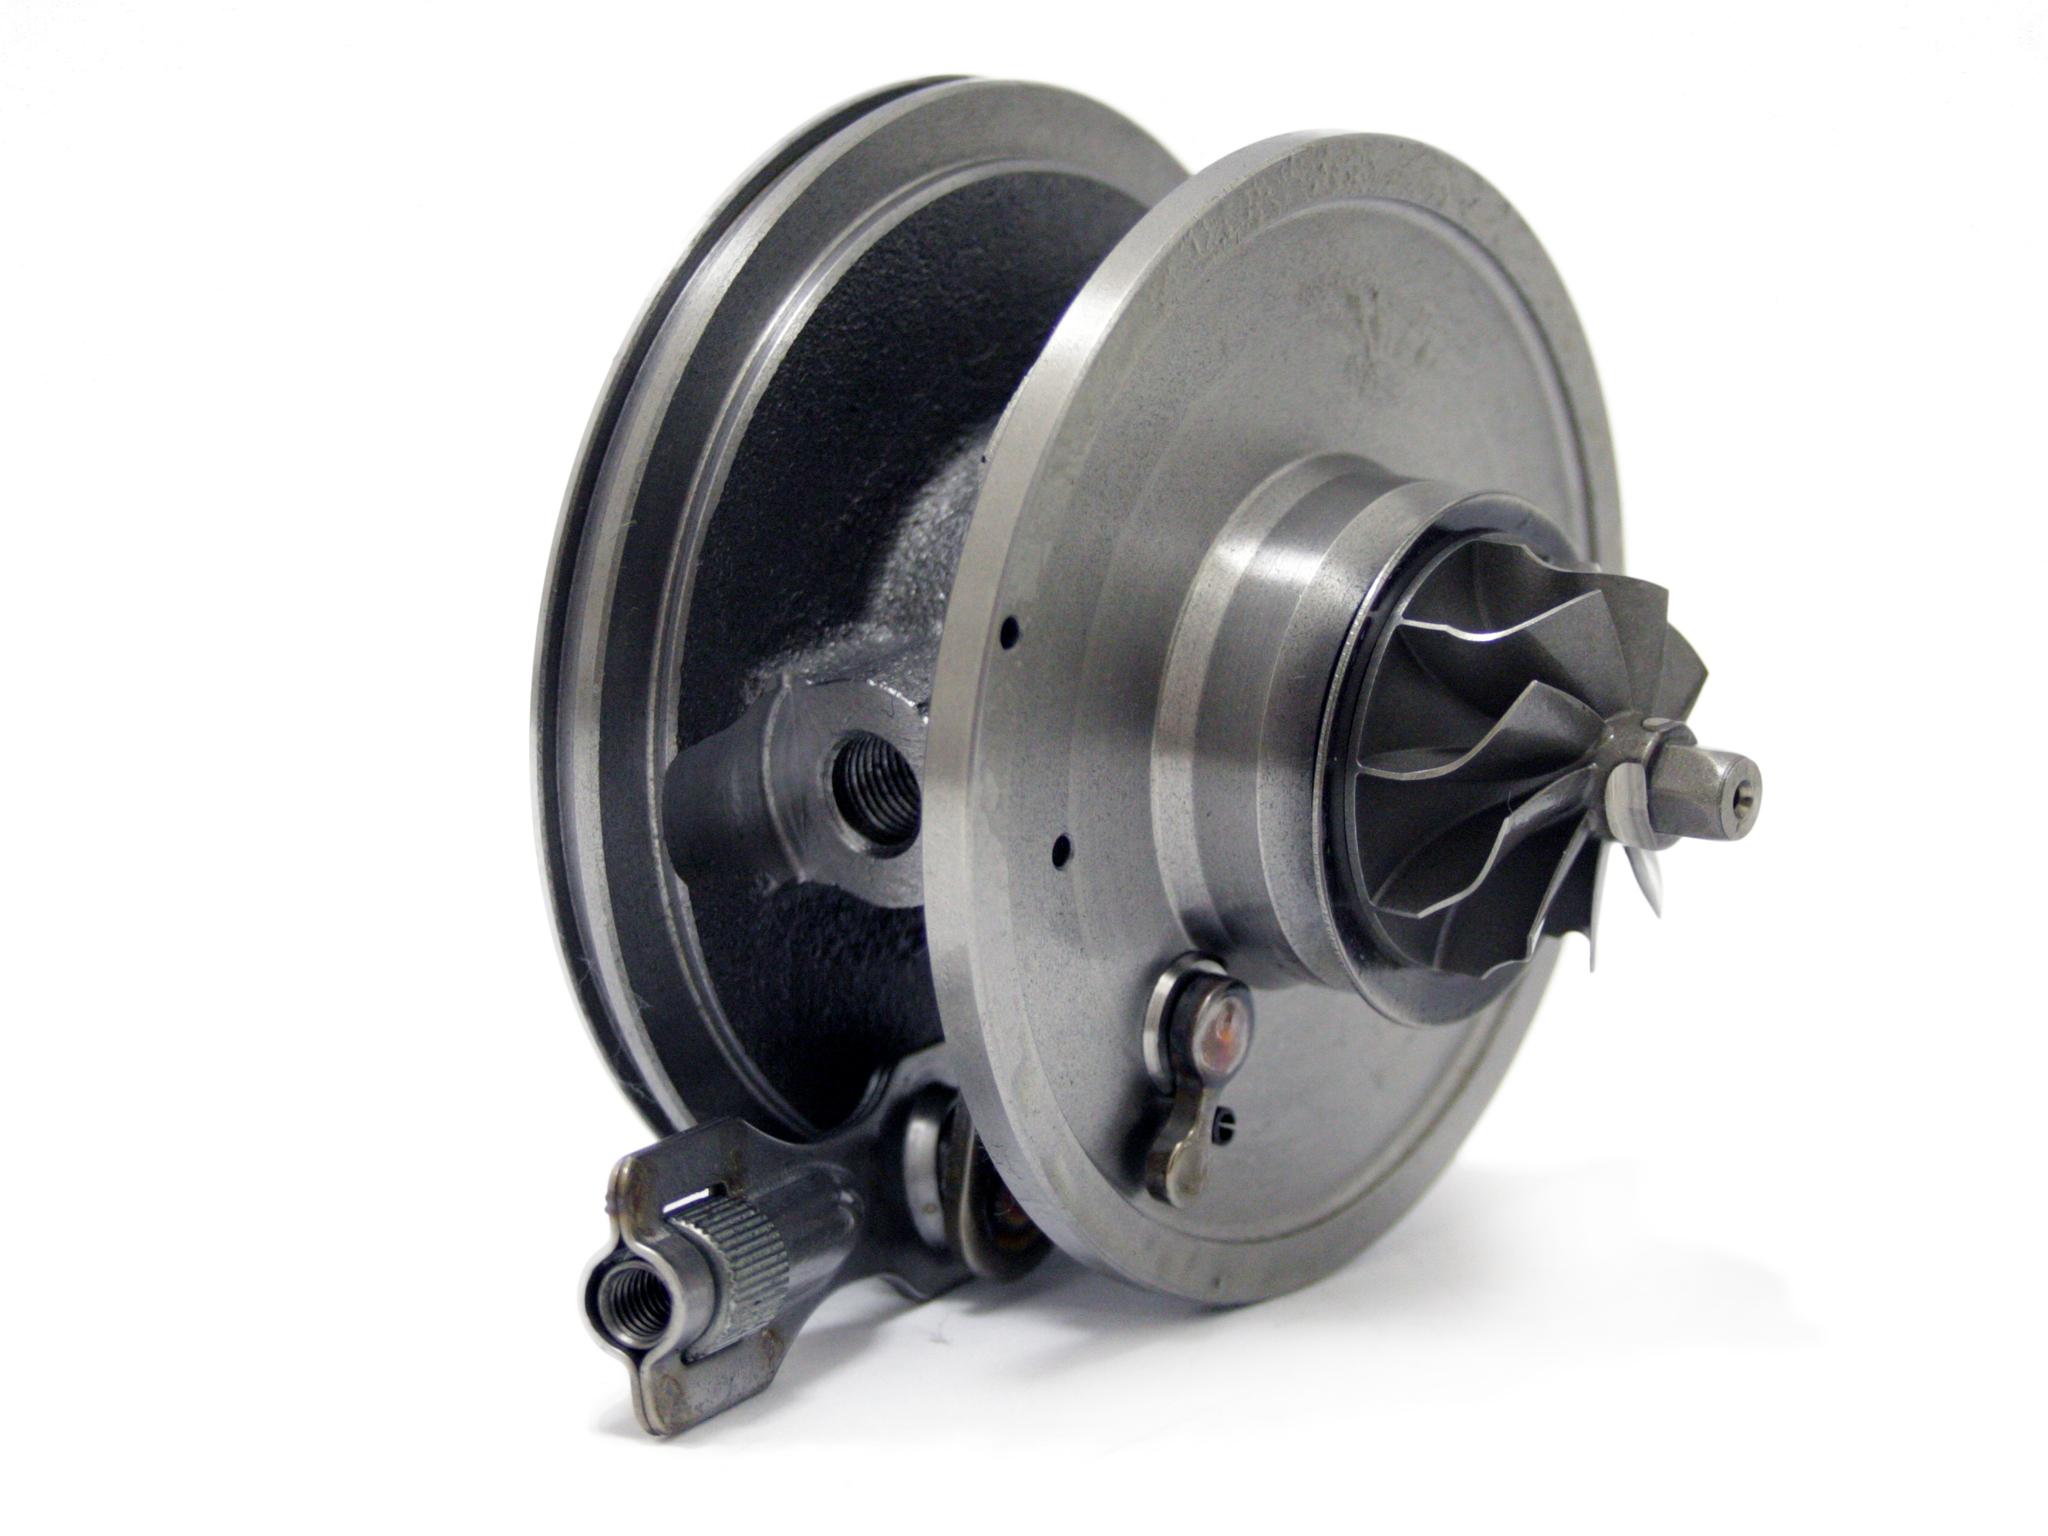 Картридж турбины BV35 Фиат 1.3 JTD 85 / 90 л.с.